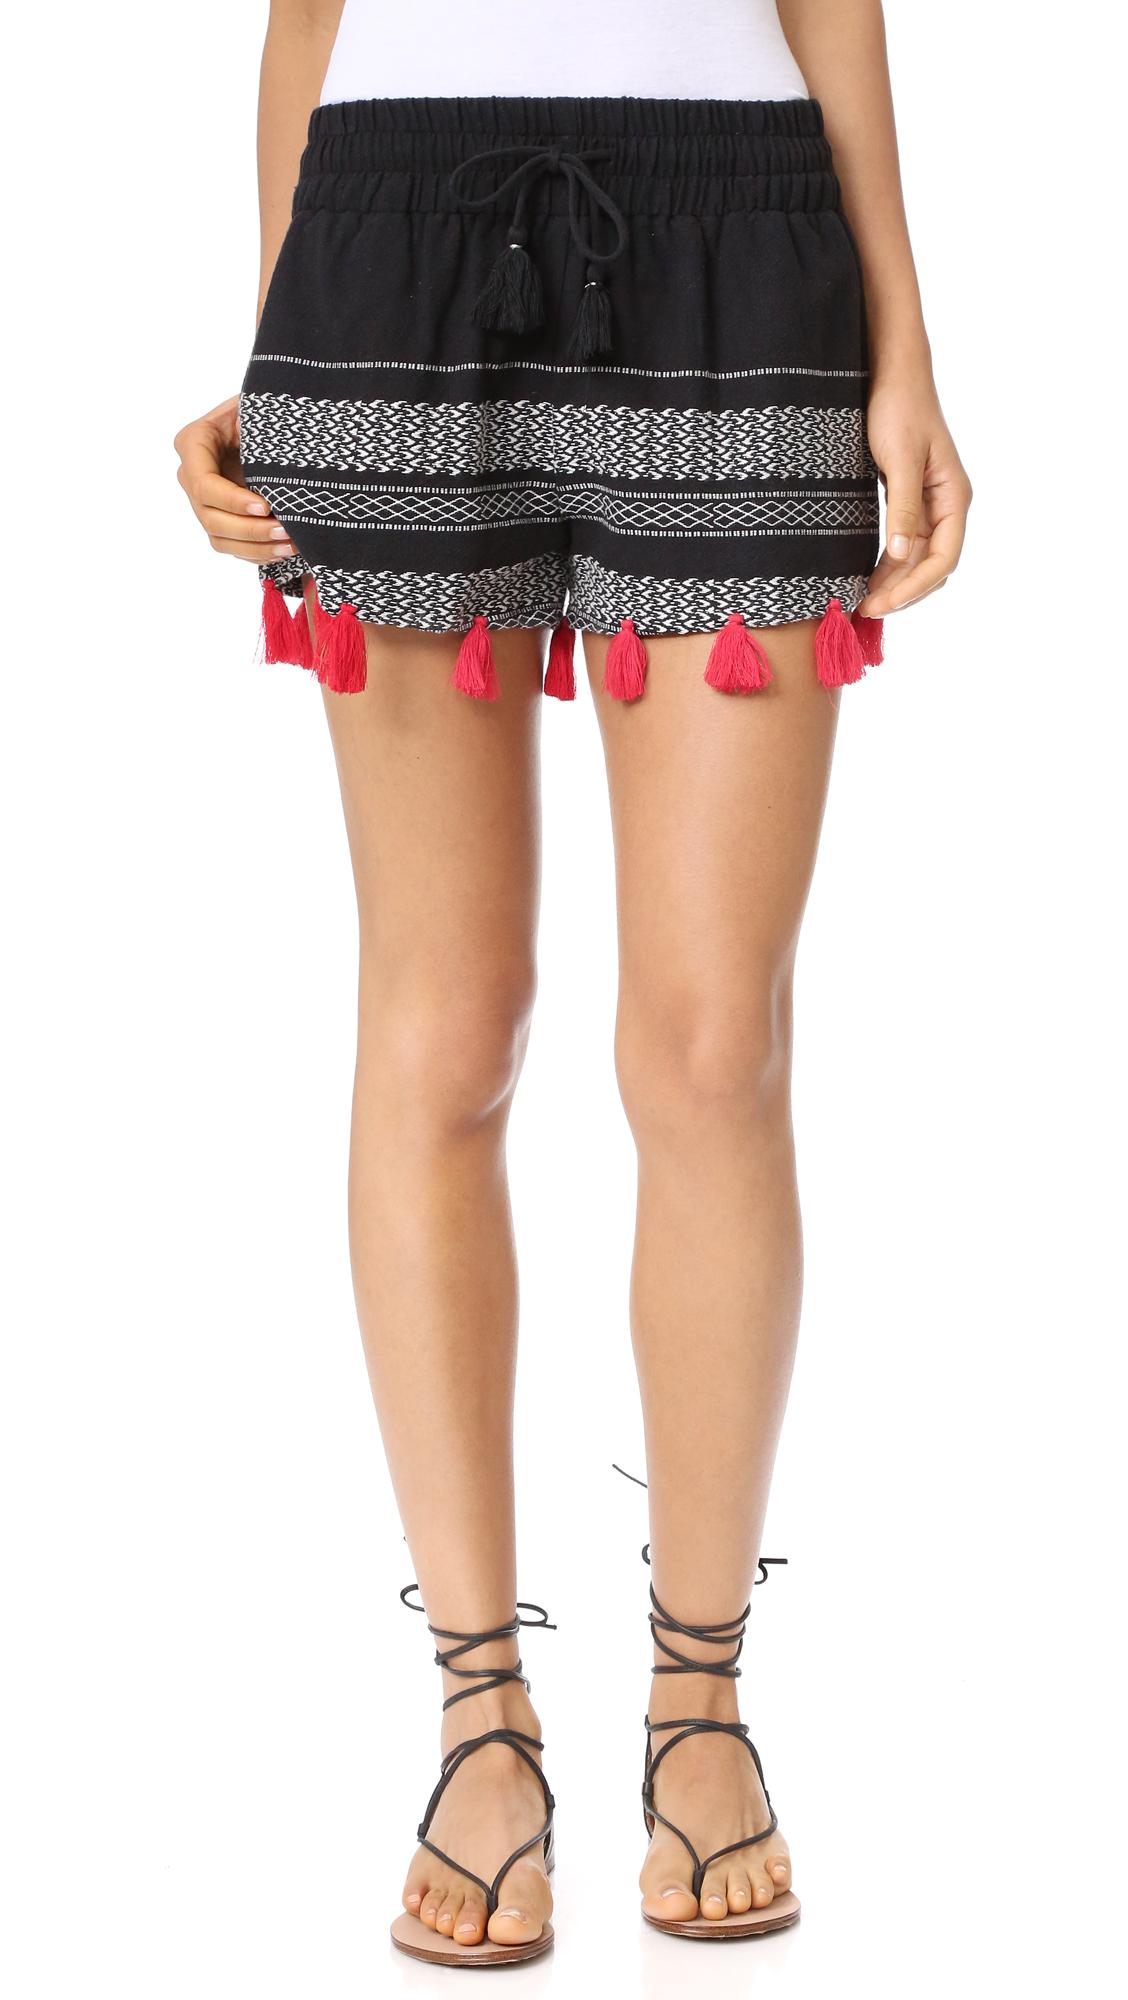 piper female piper tassle shorts black